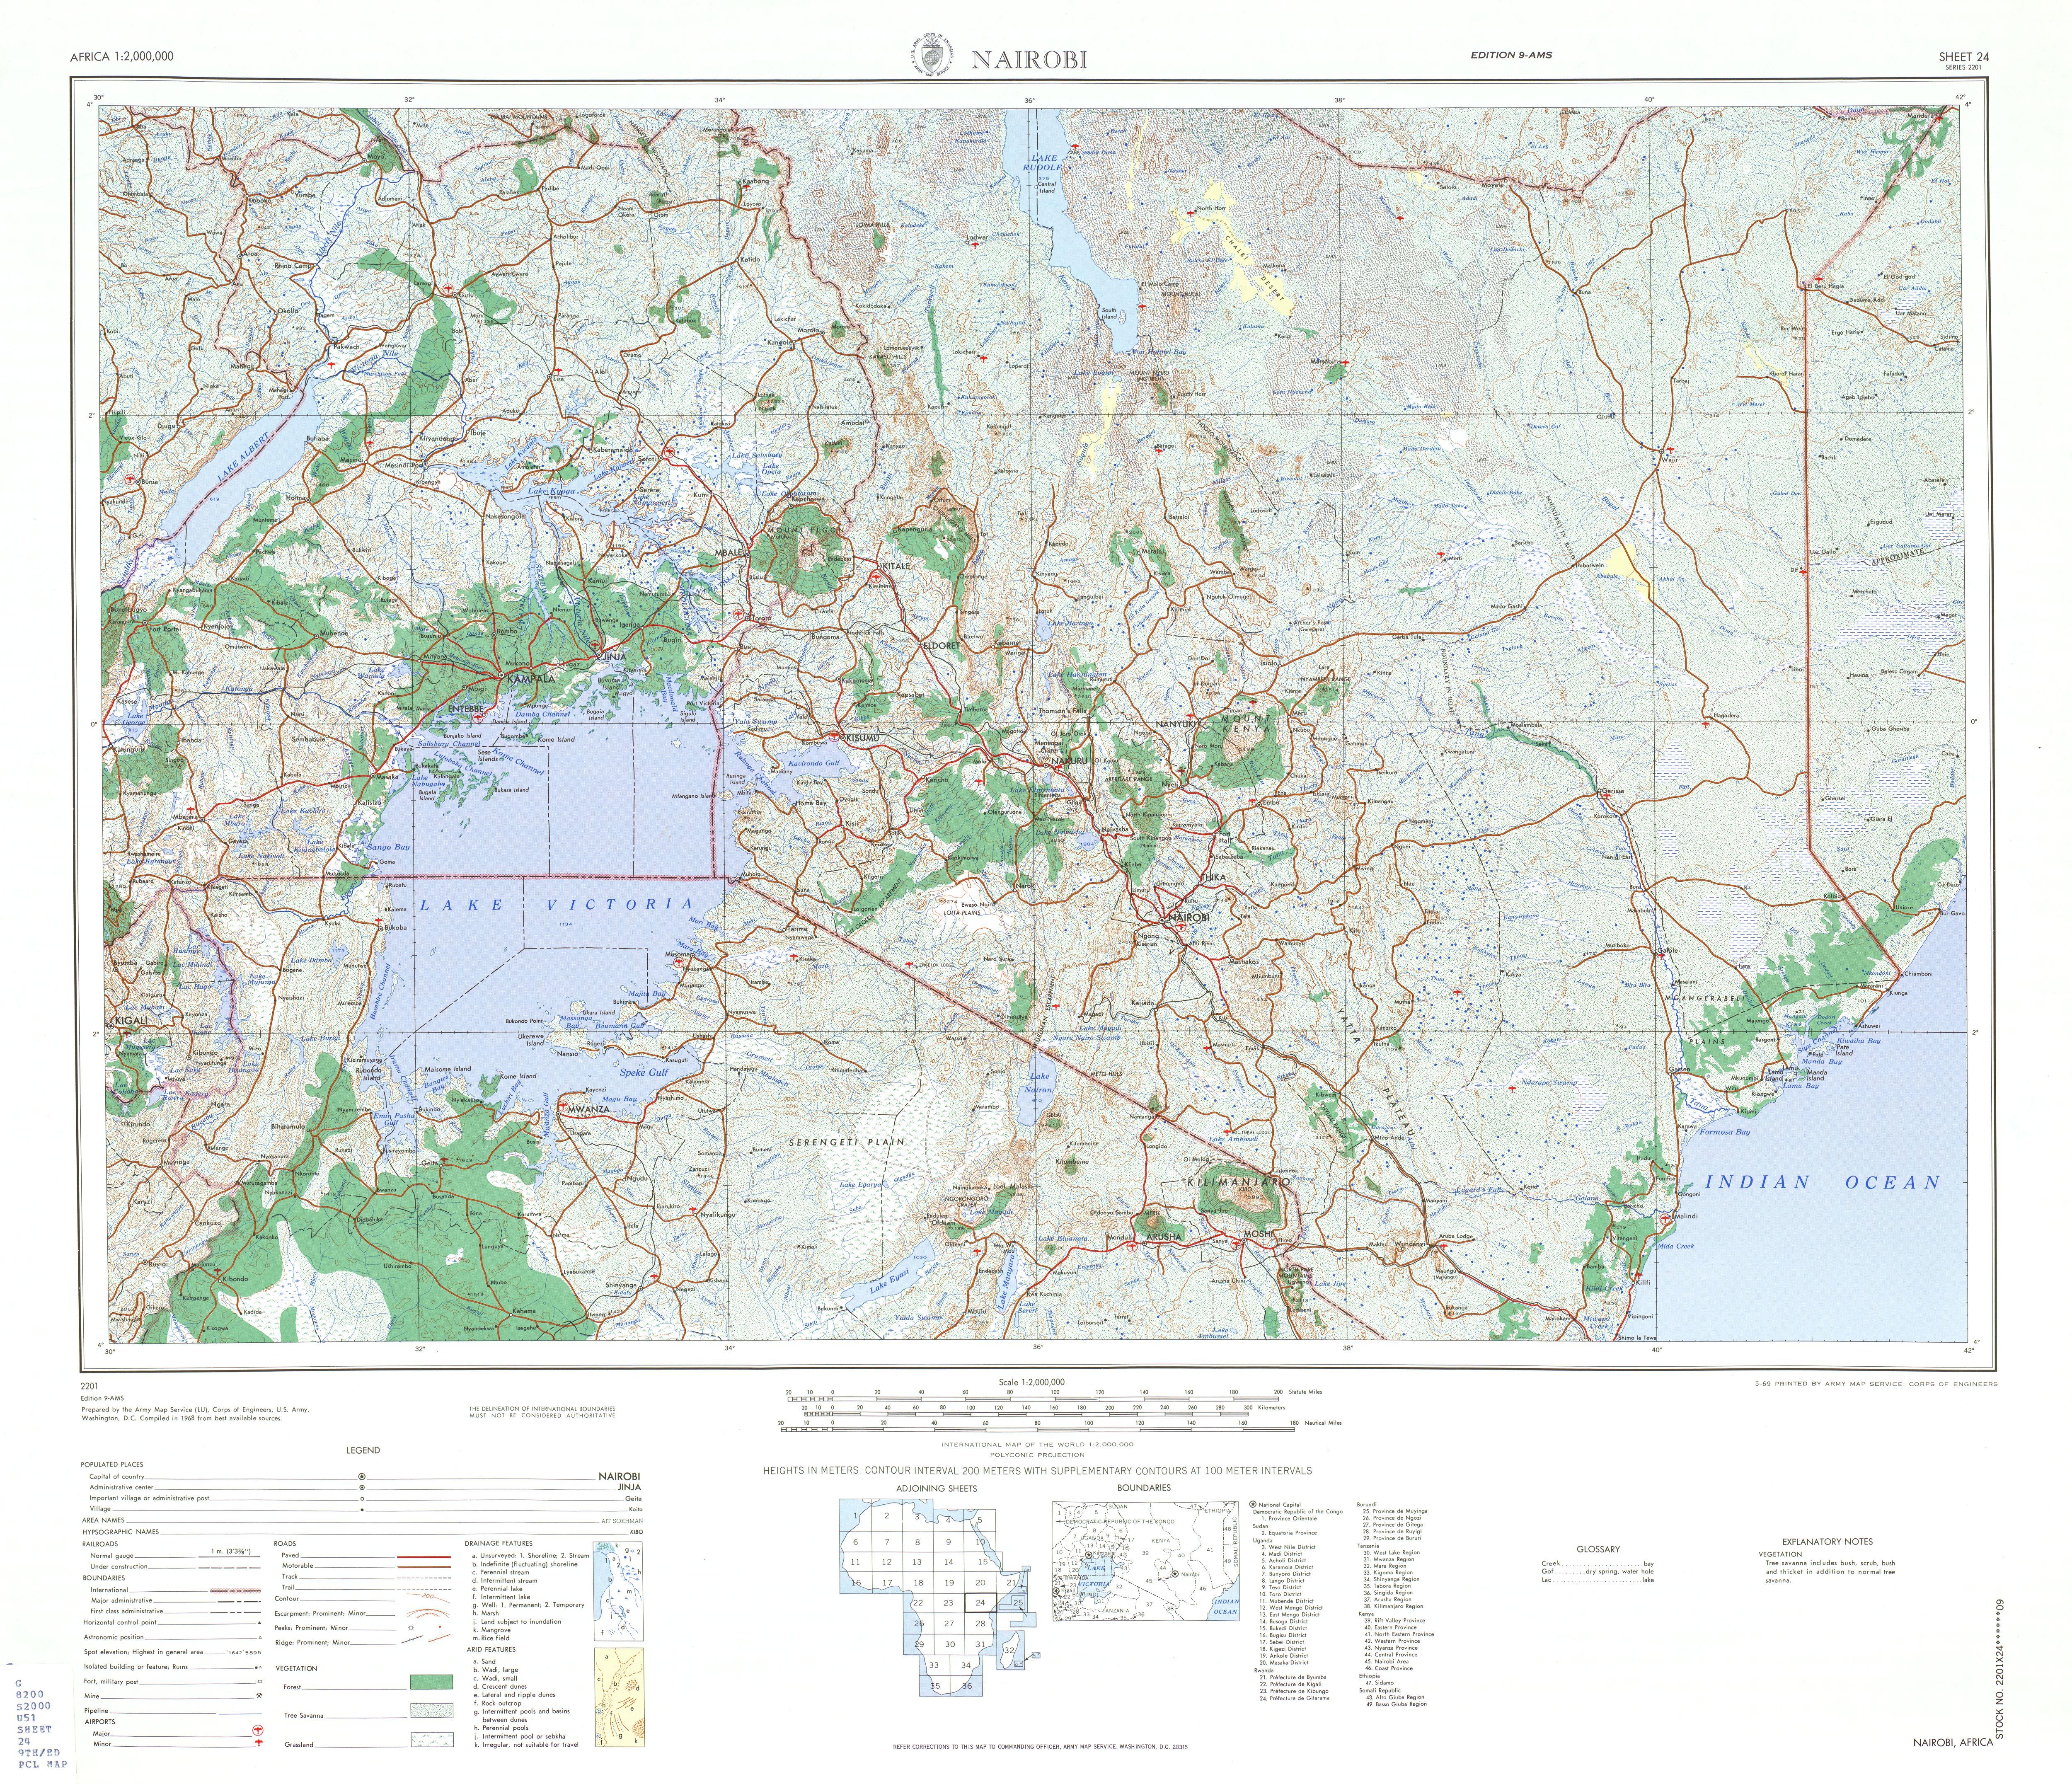 Hoja Nairobi del Mapa Topográfico de África 1968